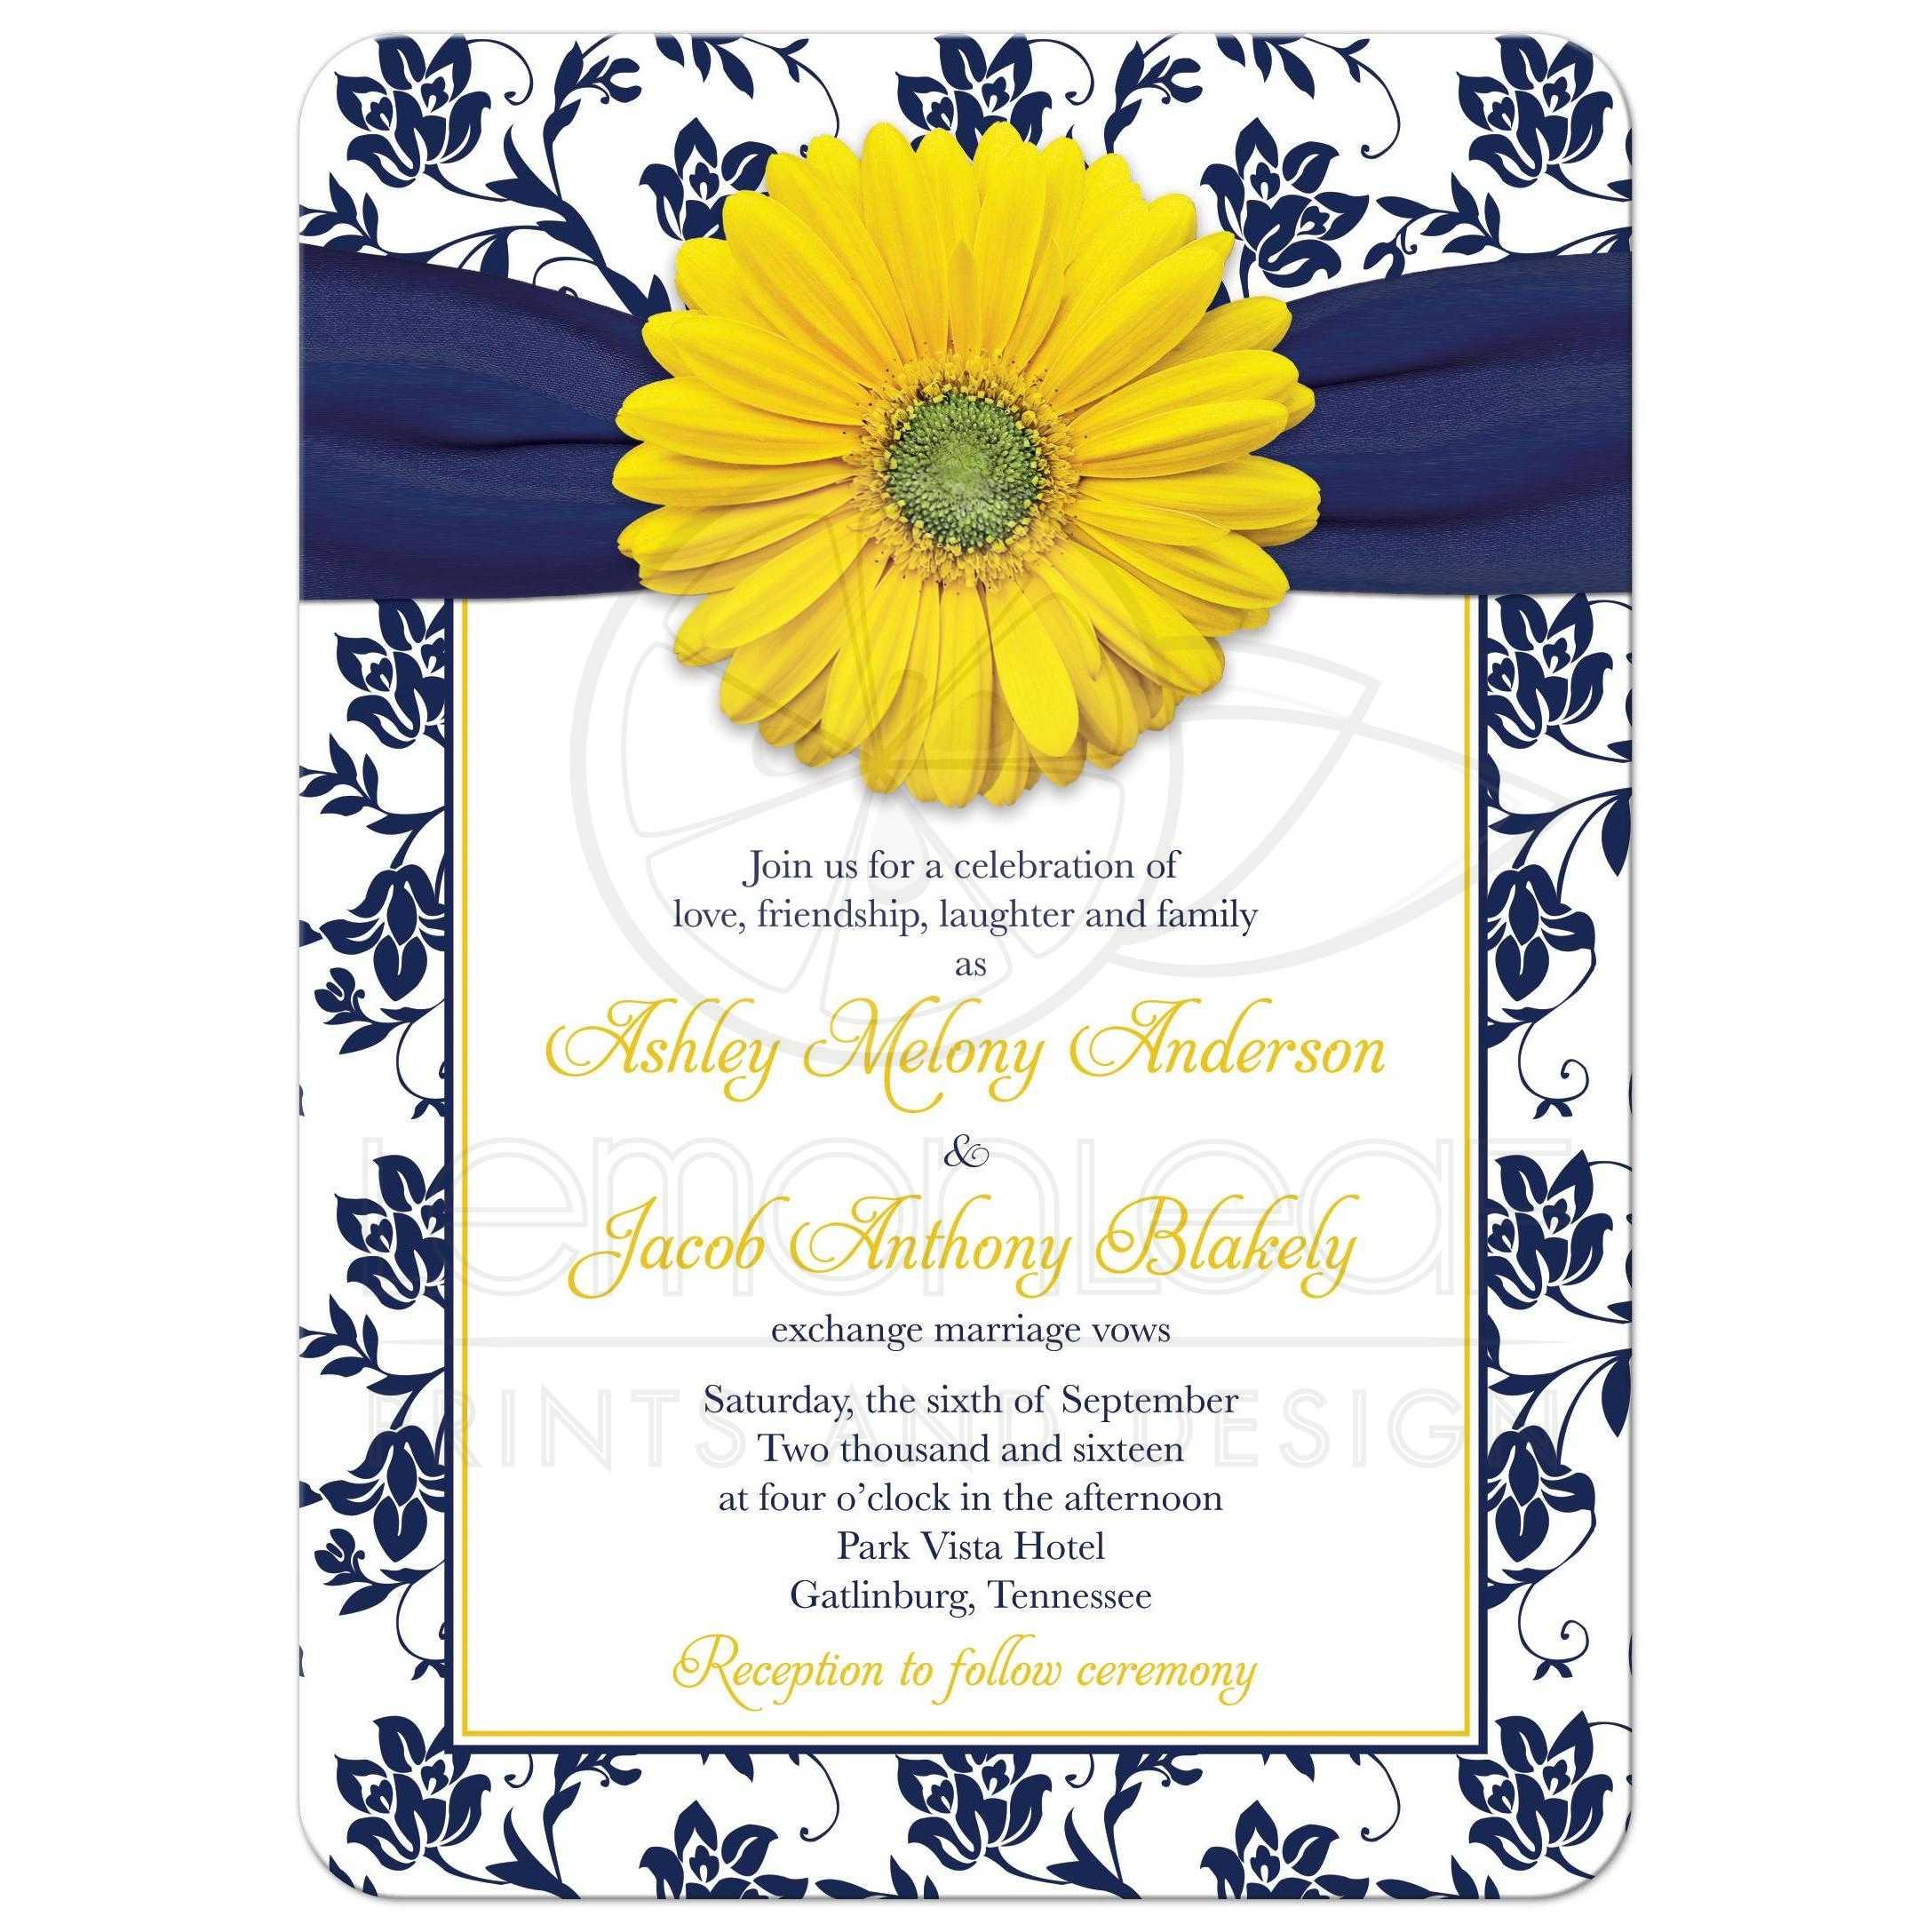 White Daisy Wedding Invitation: Yellow Daisy Navy Floral Wedding Invitation